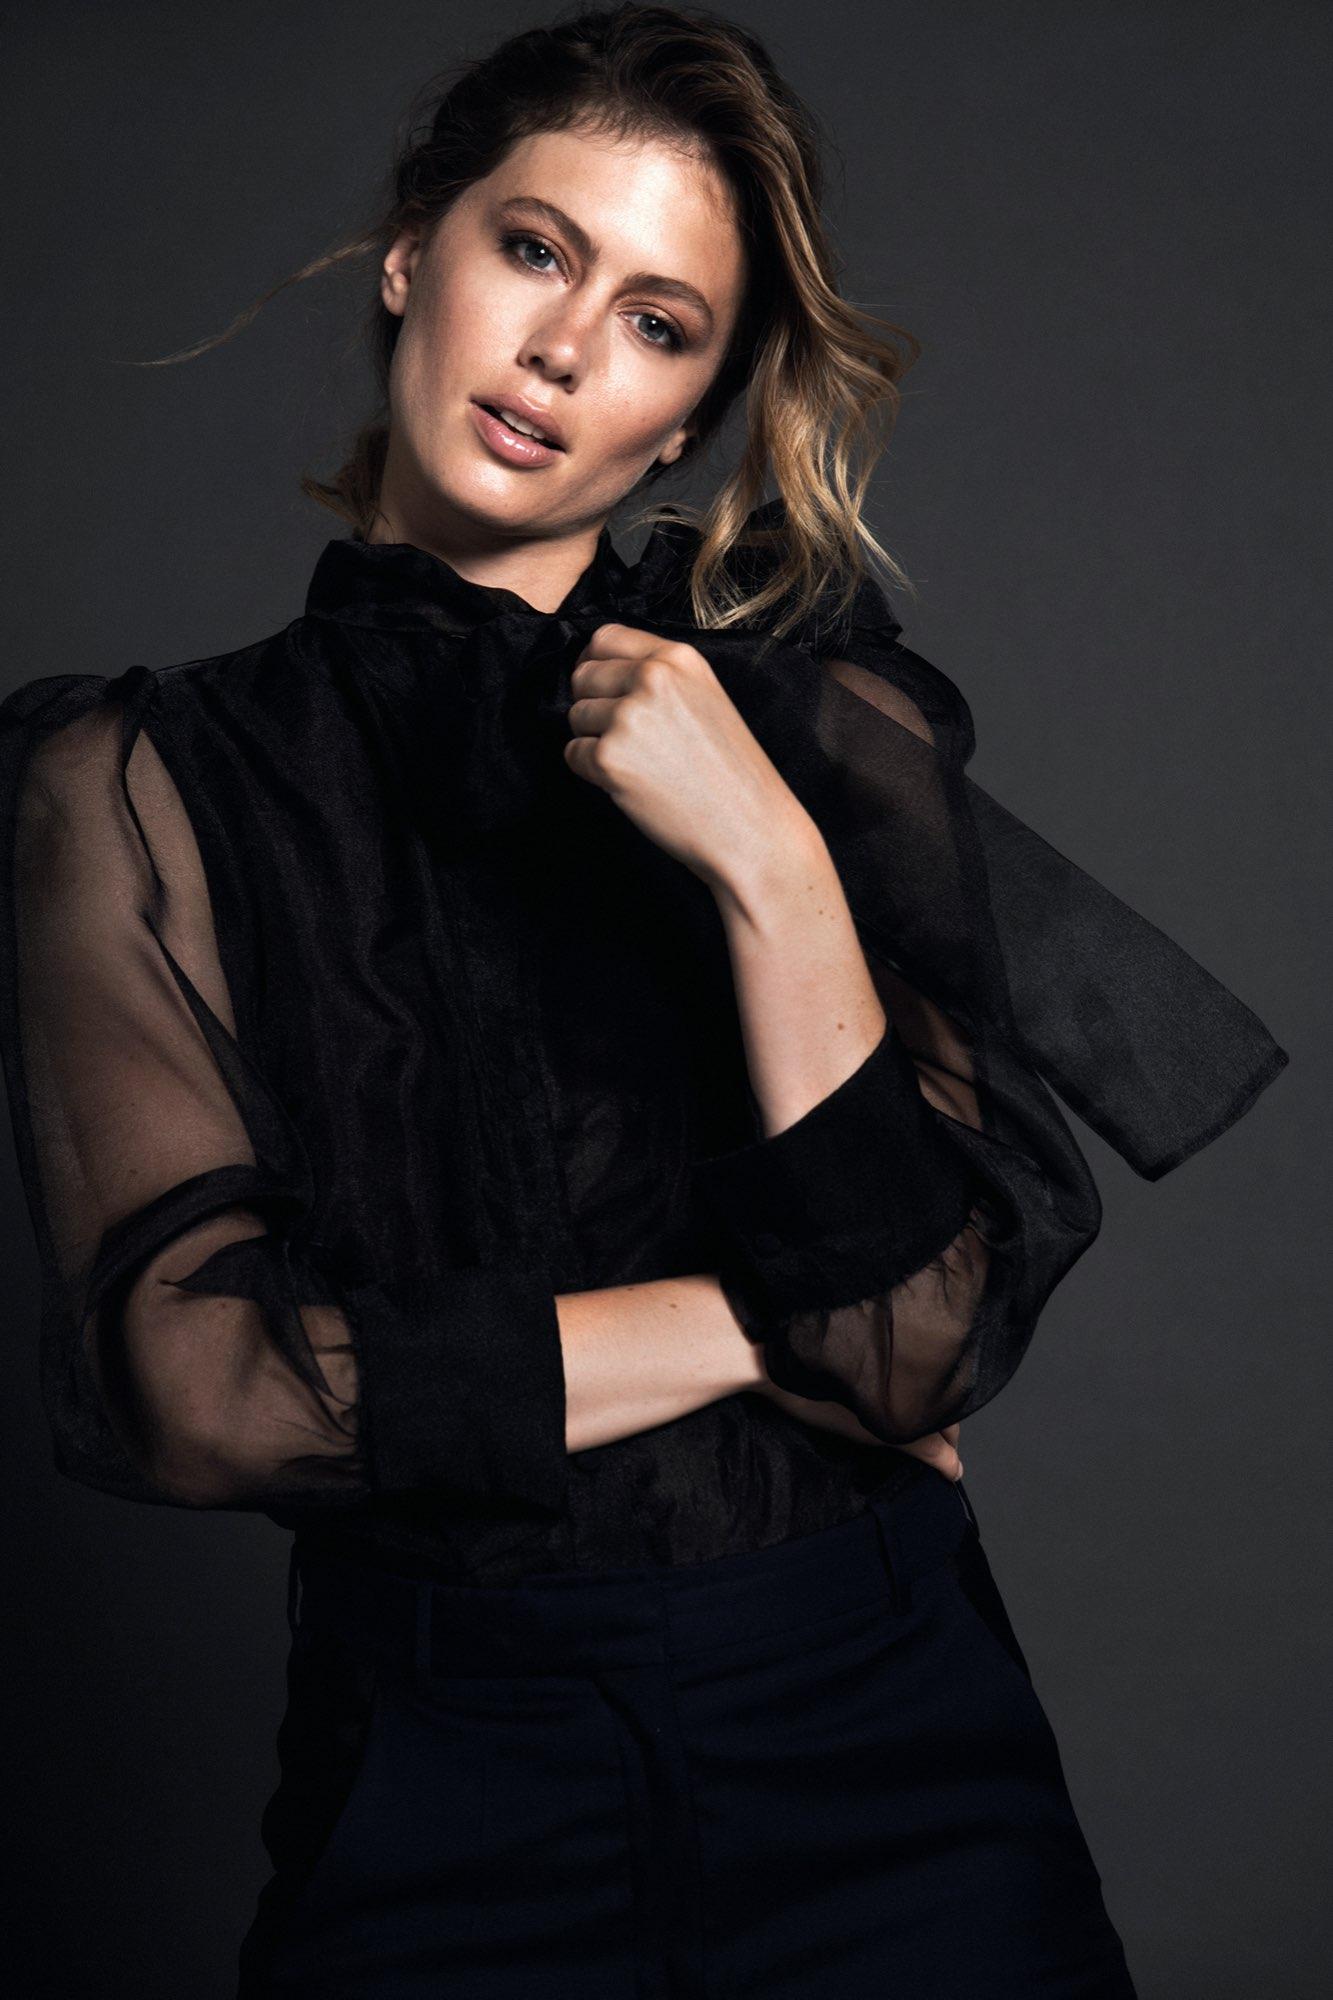 Hair, Nail, Make-up und Fashion styling portfolio / laura-moser - testshooting-ellin-portfolio--ID678-1.jpeg?v=1597754140